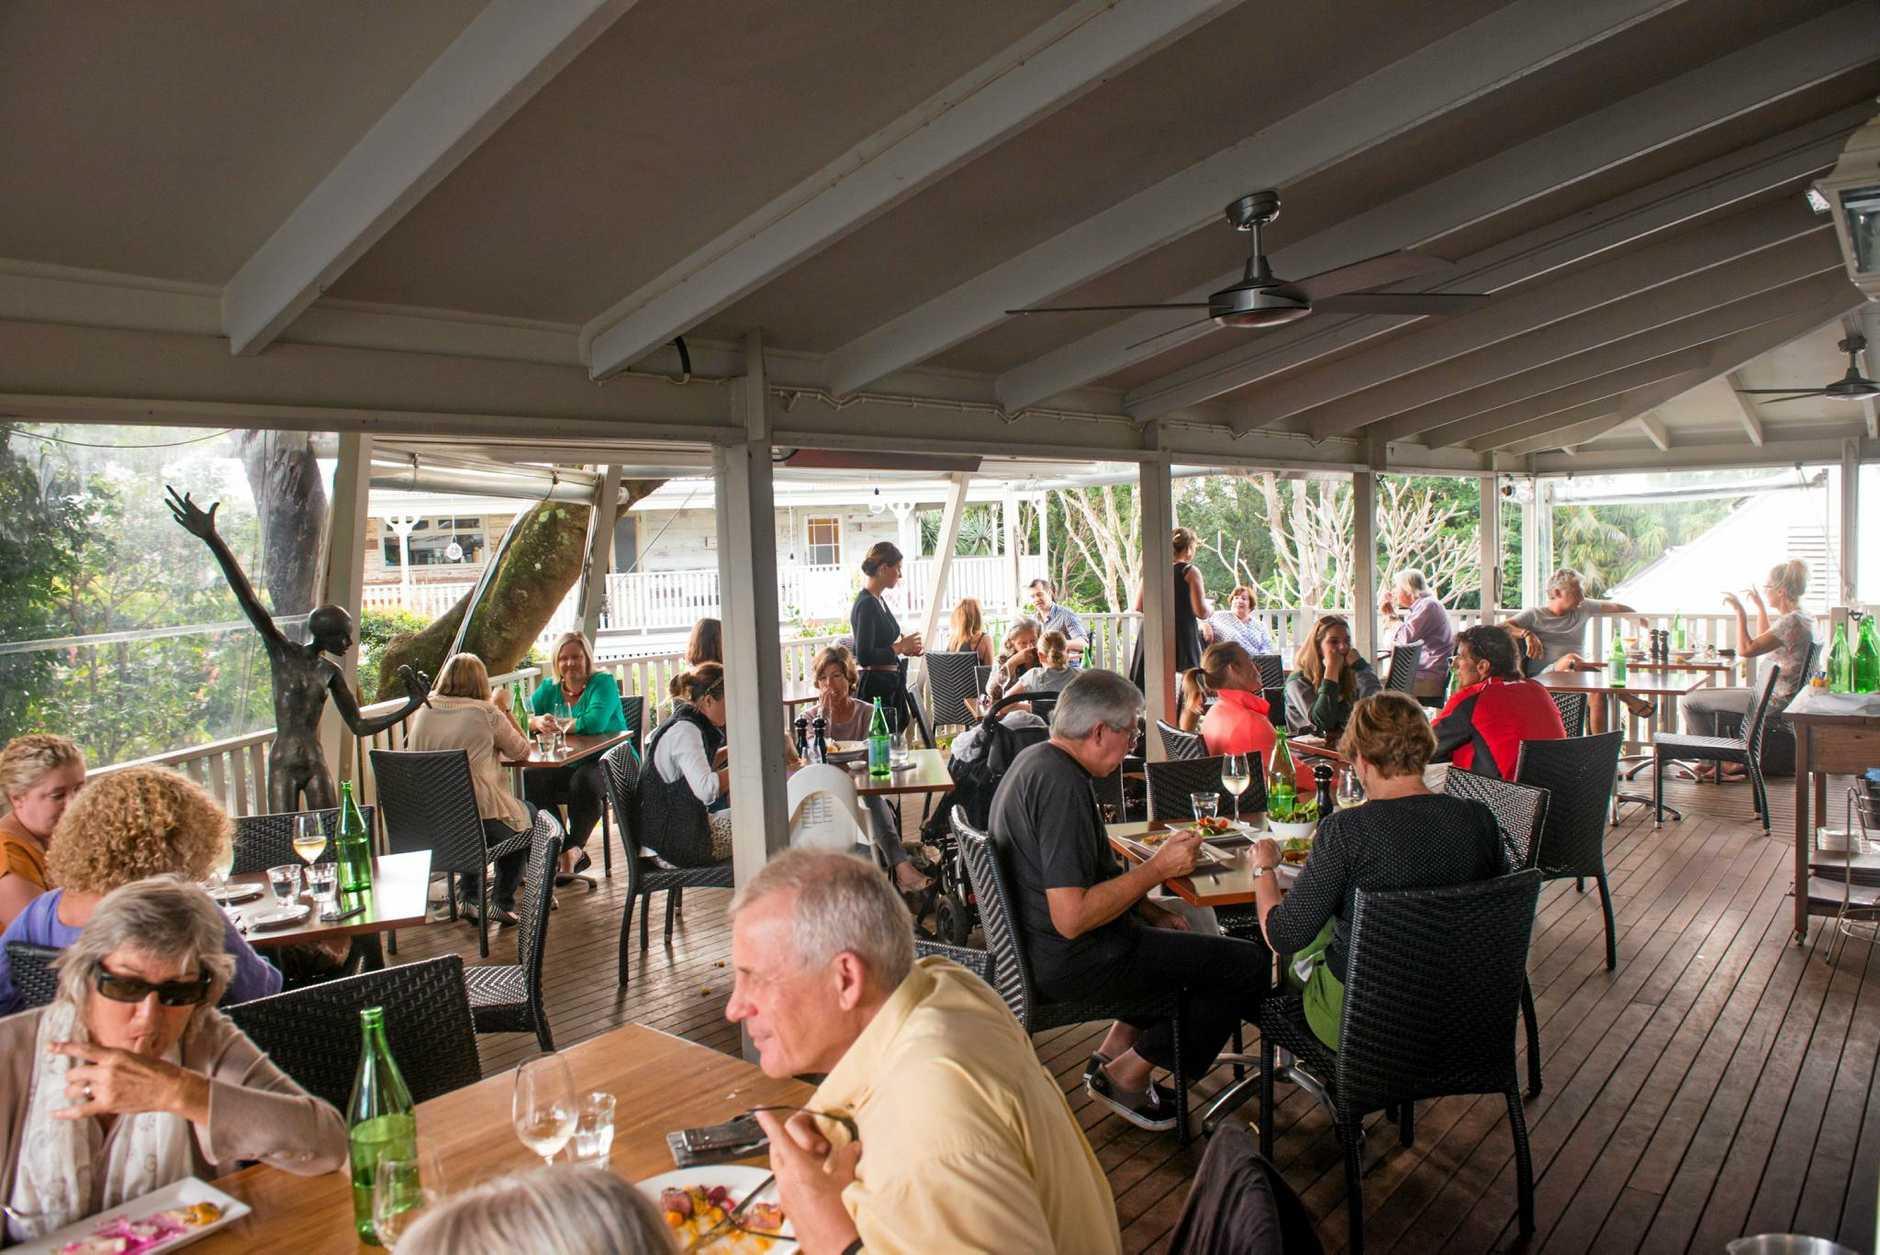 Newrybar's Harvest Café named second best Aussie restaurant for a weekend getaway. Photo Contributed